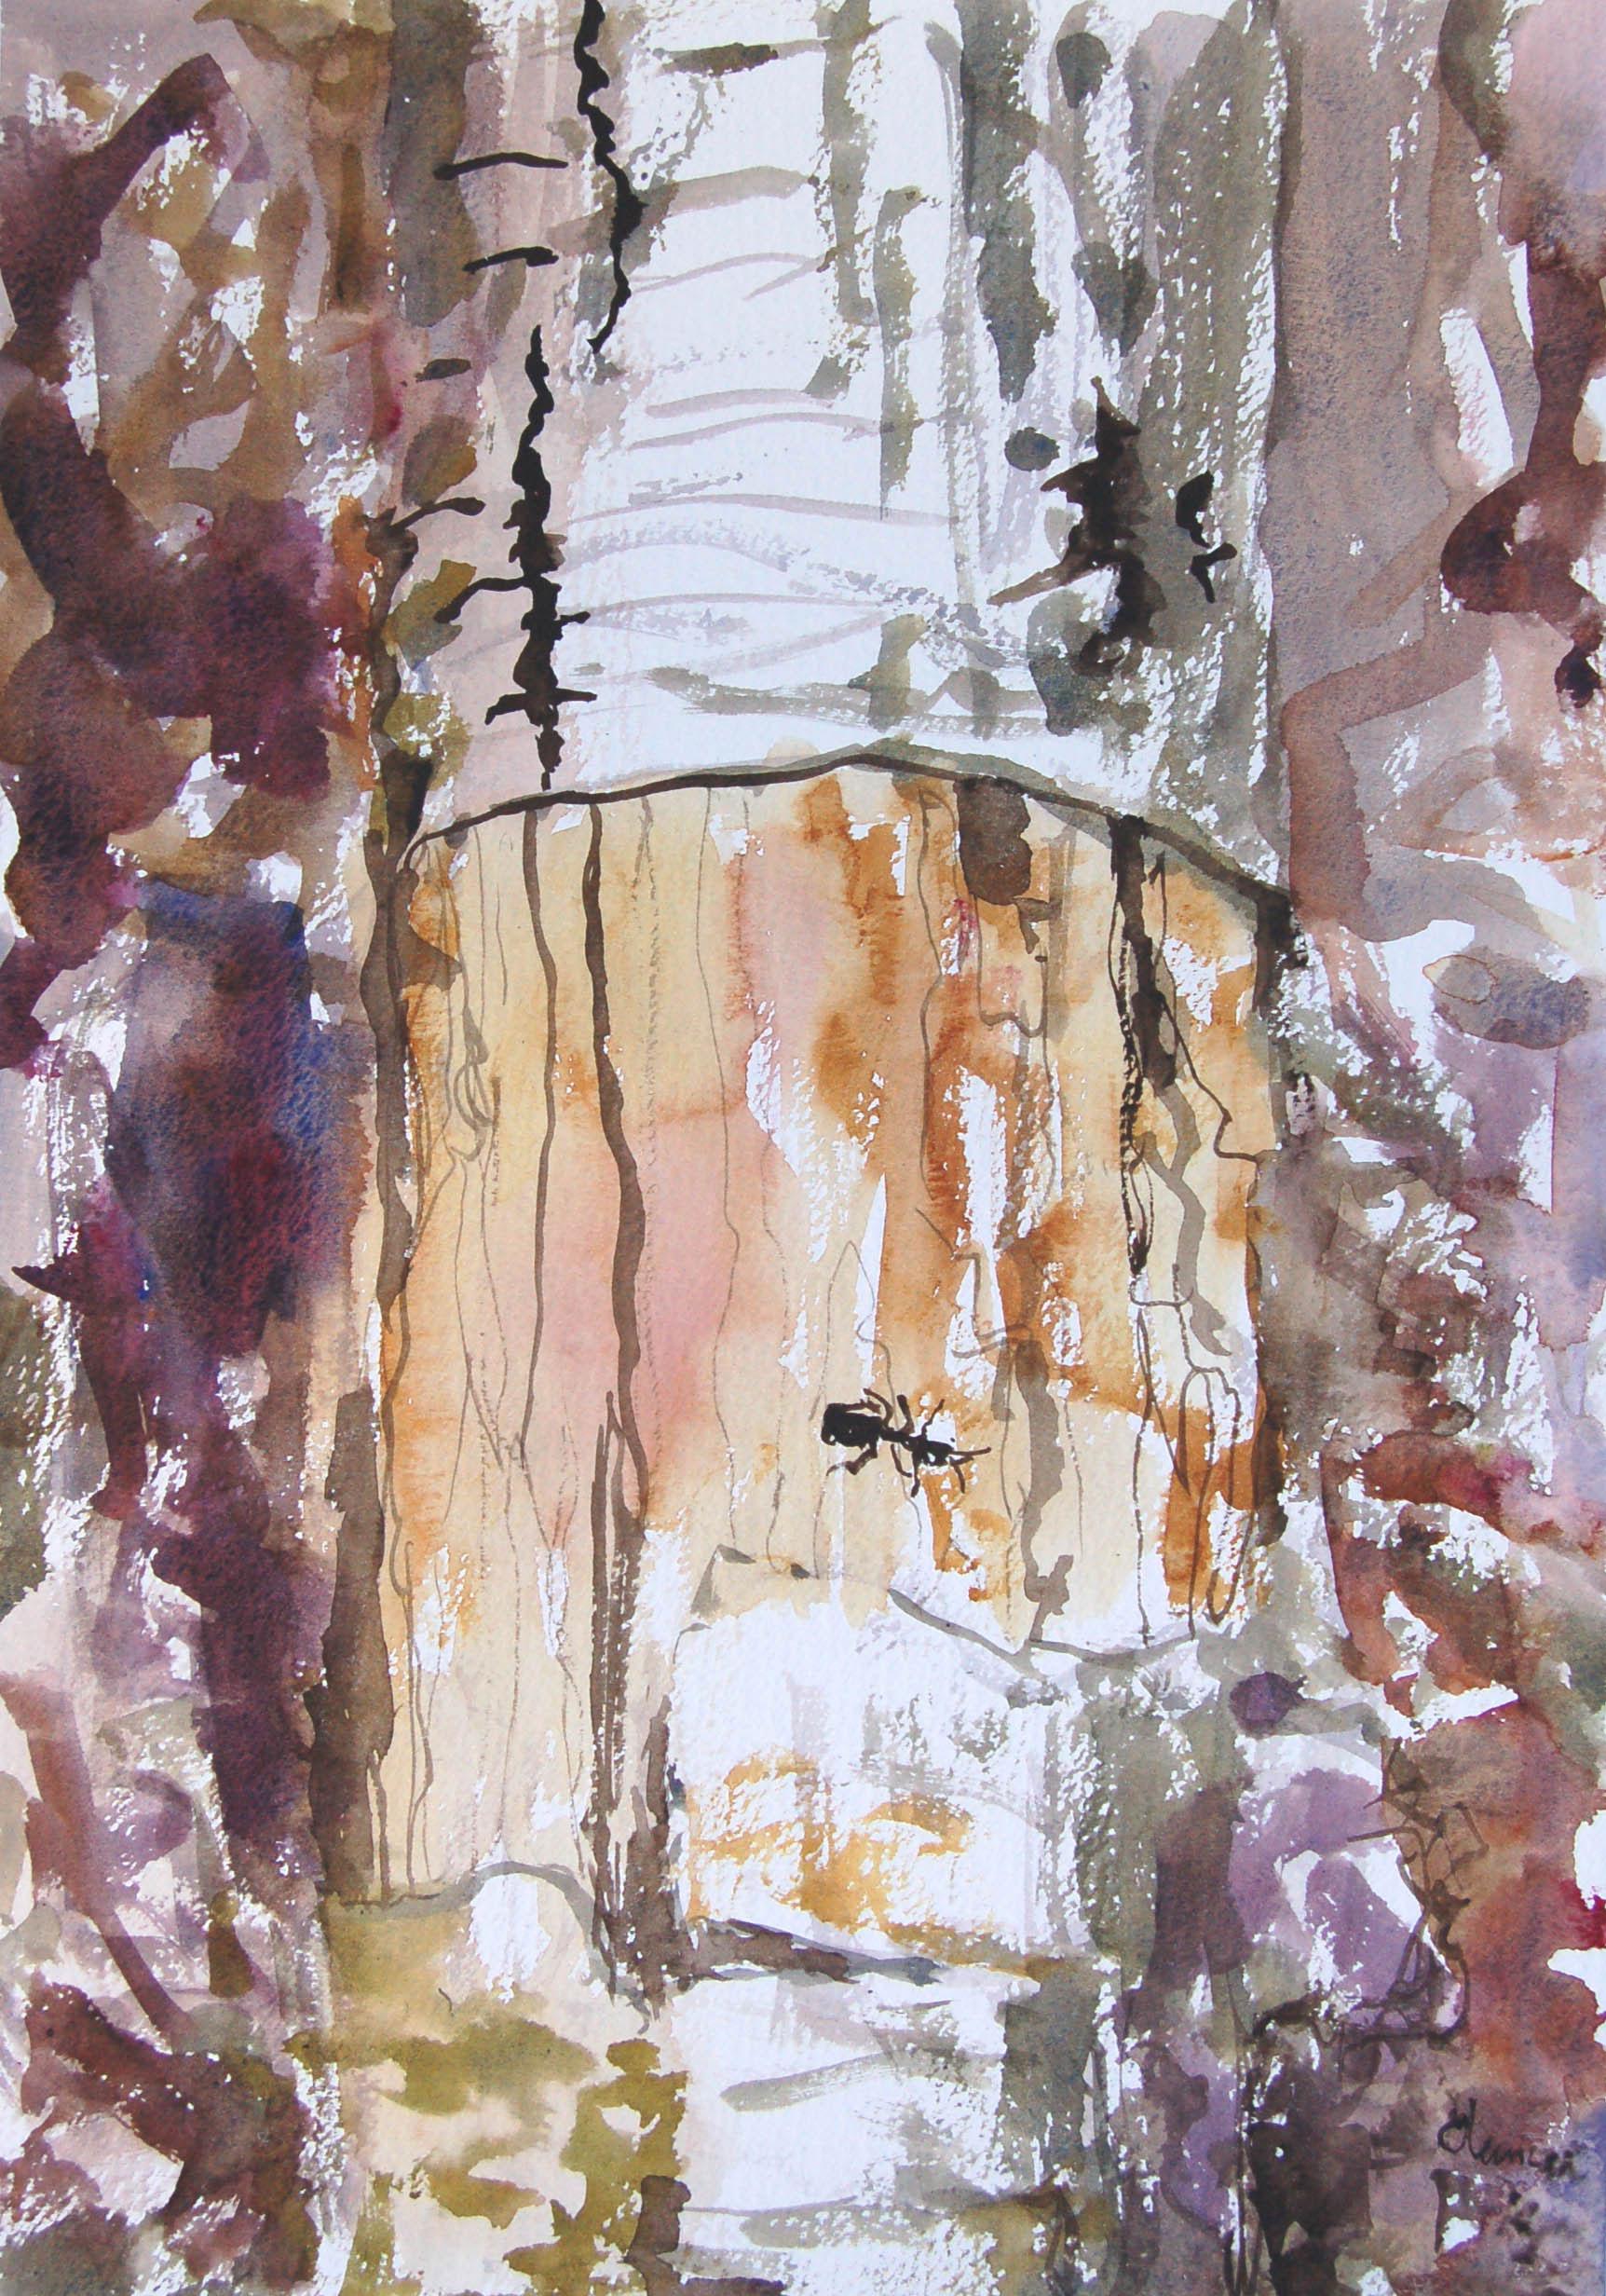 Wood-ant-on-birch-branch.-31.5